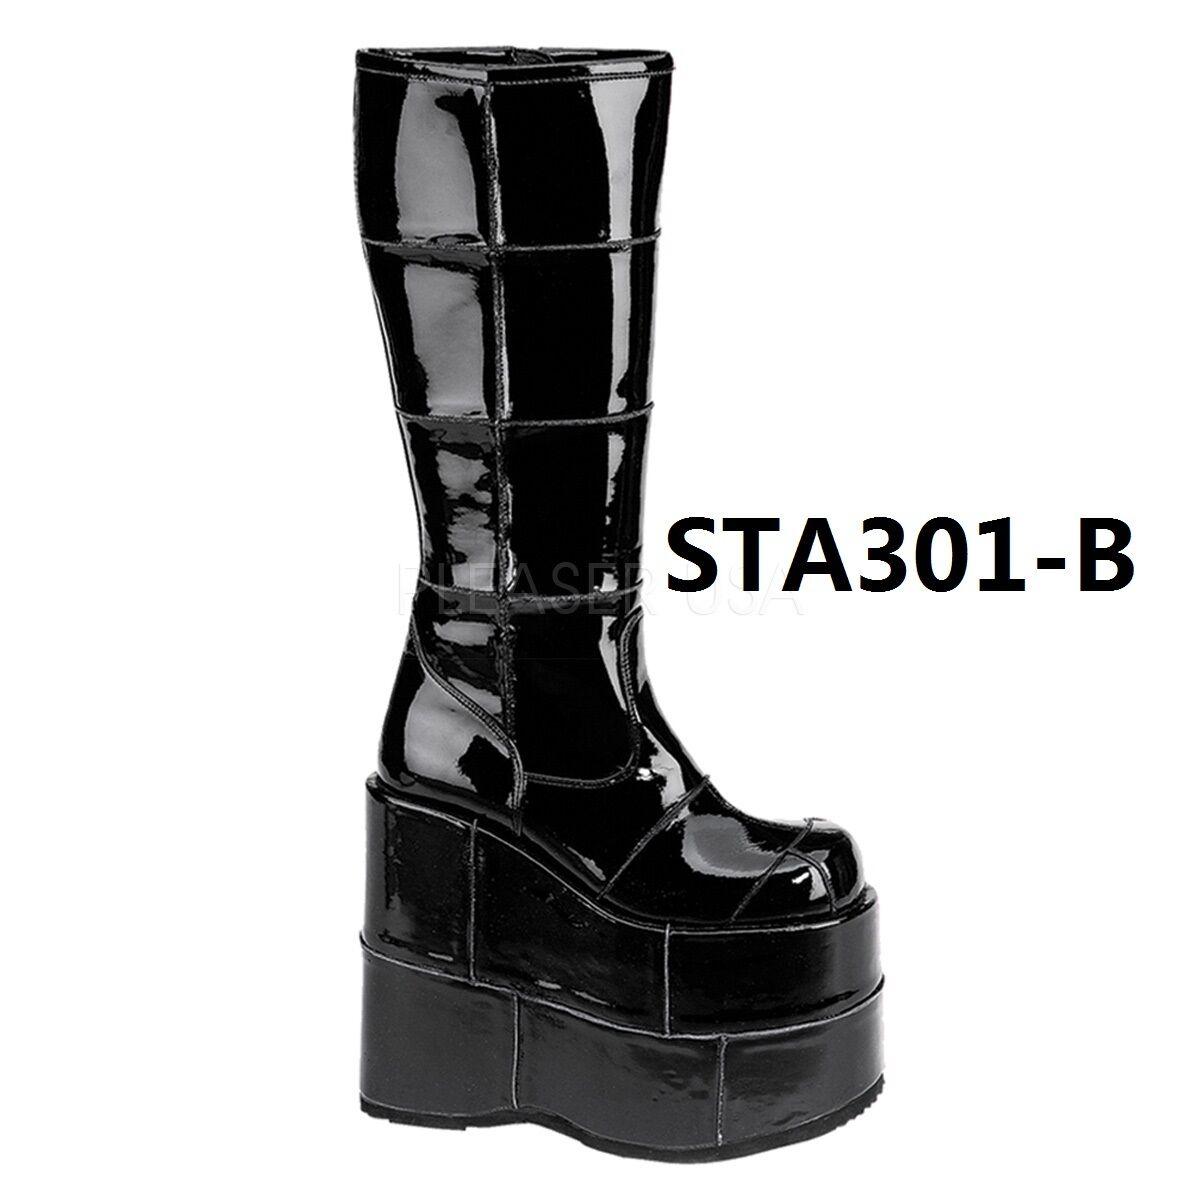 Demonia Stack  301 308 318 para hombres Cyber 7 P/F Gótico Cyber hombres Gogo rodilla botas 729601